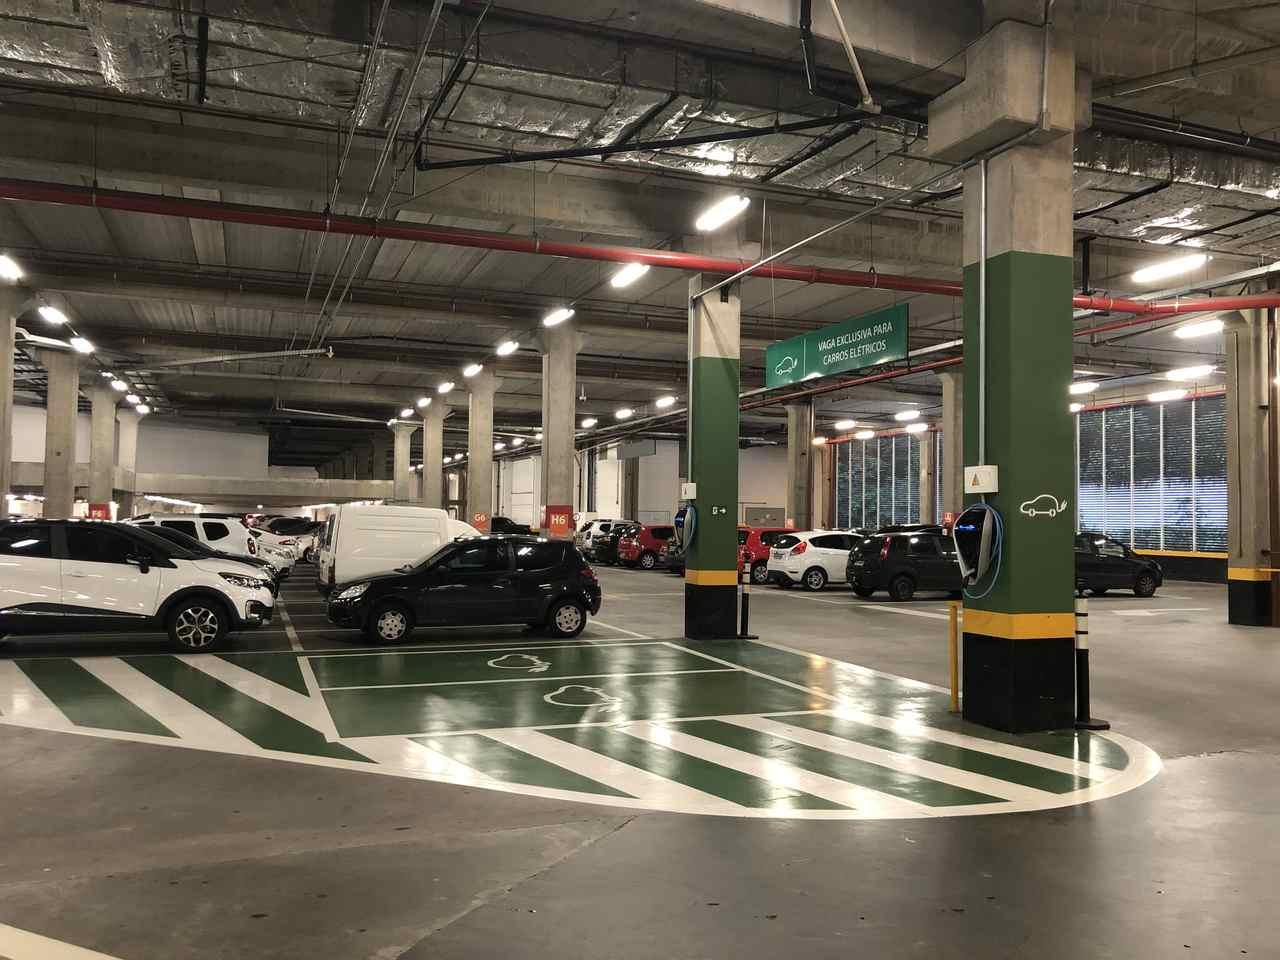 estacionamento shopping tiete plaza sao paulo